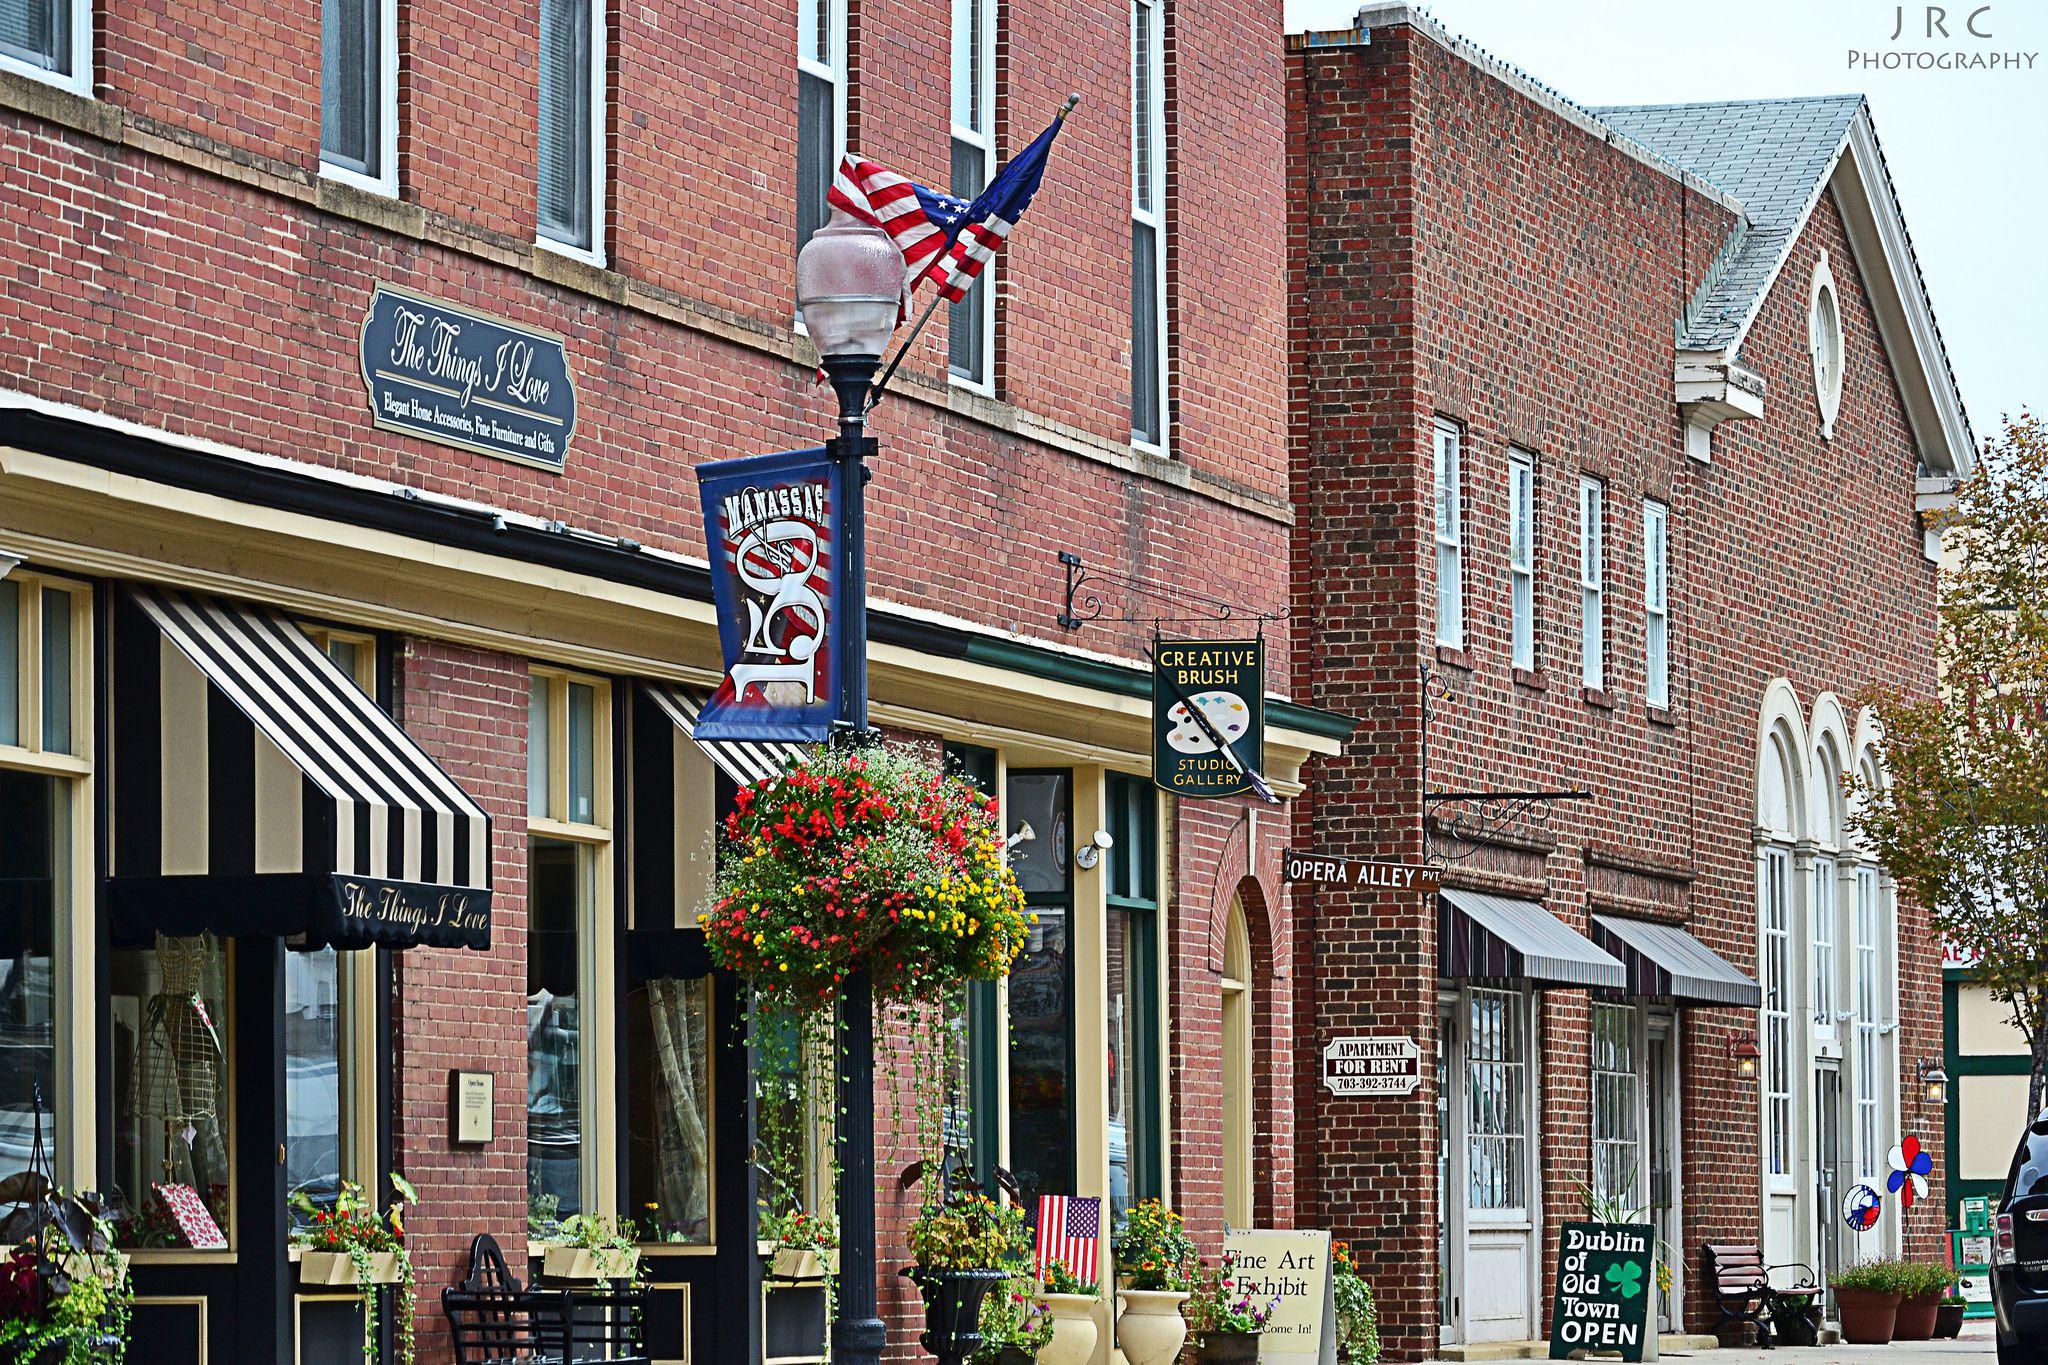 Center Street, Old Town Manassas